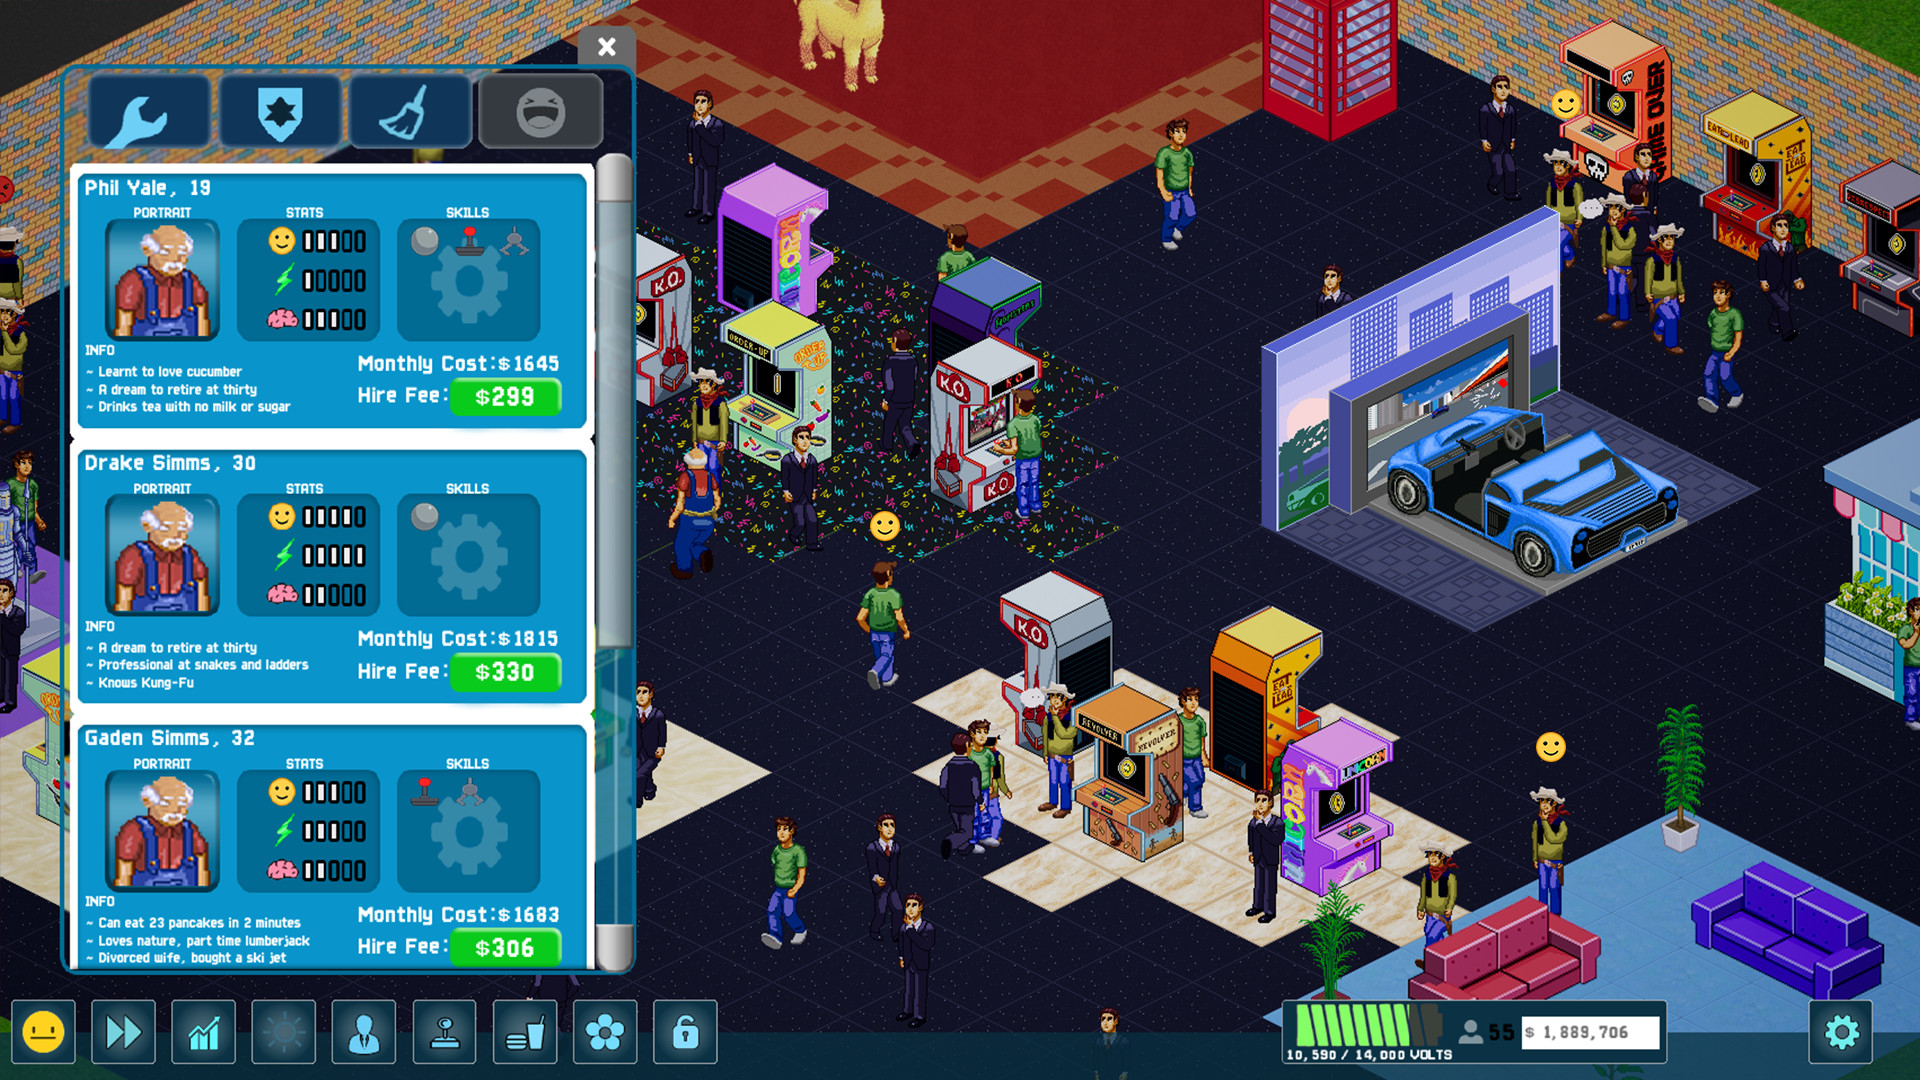 Arcade Tycoon on Steam